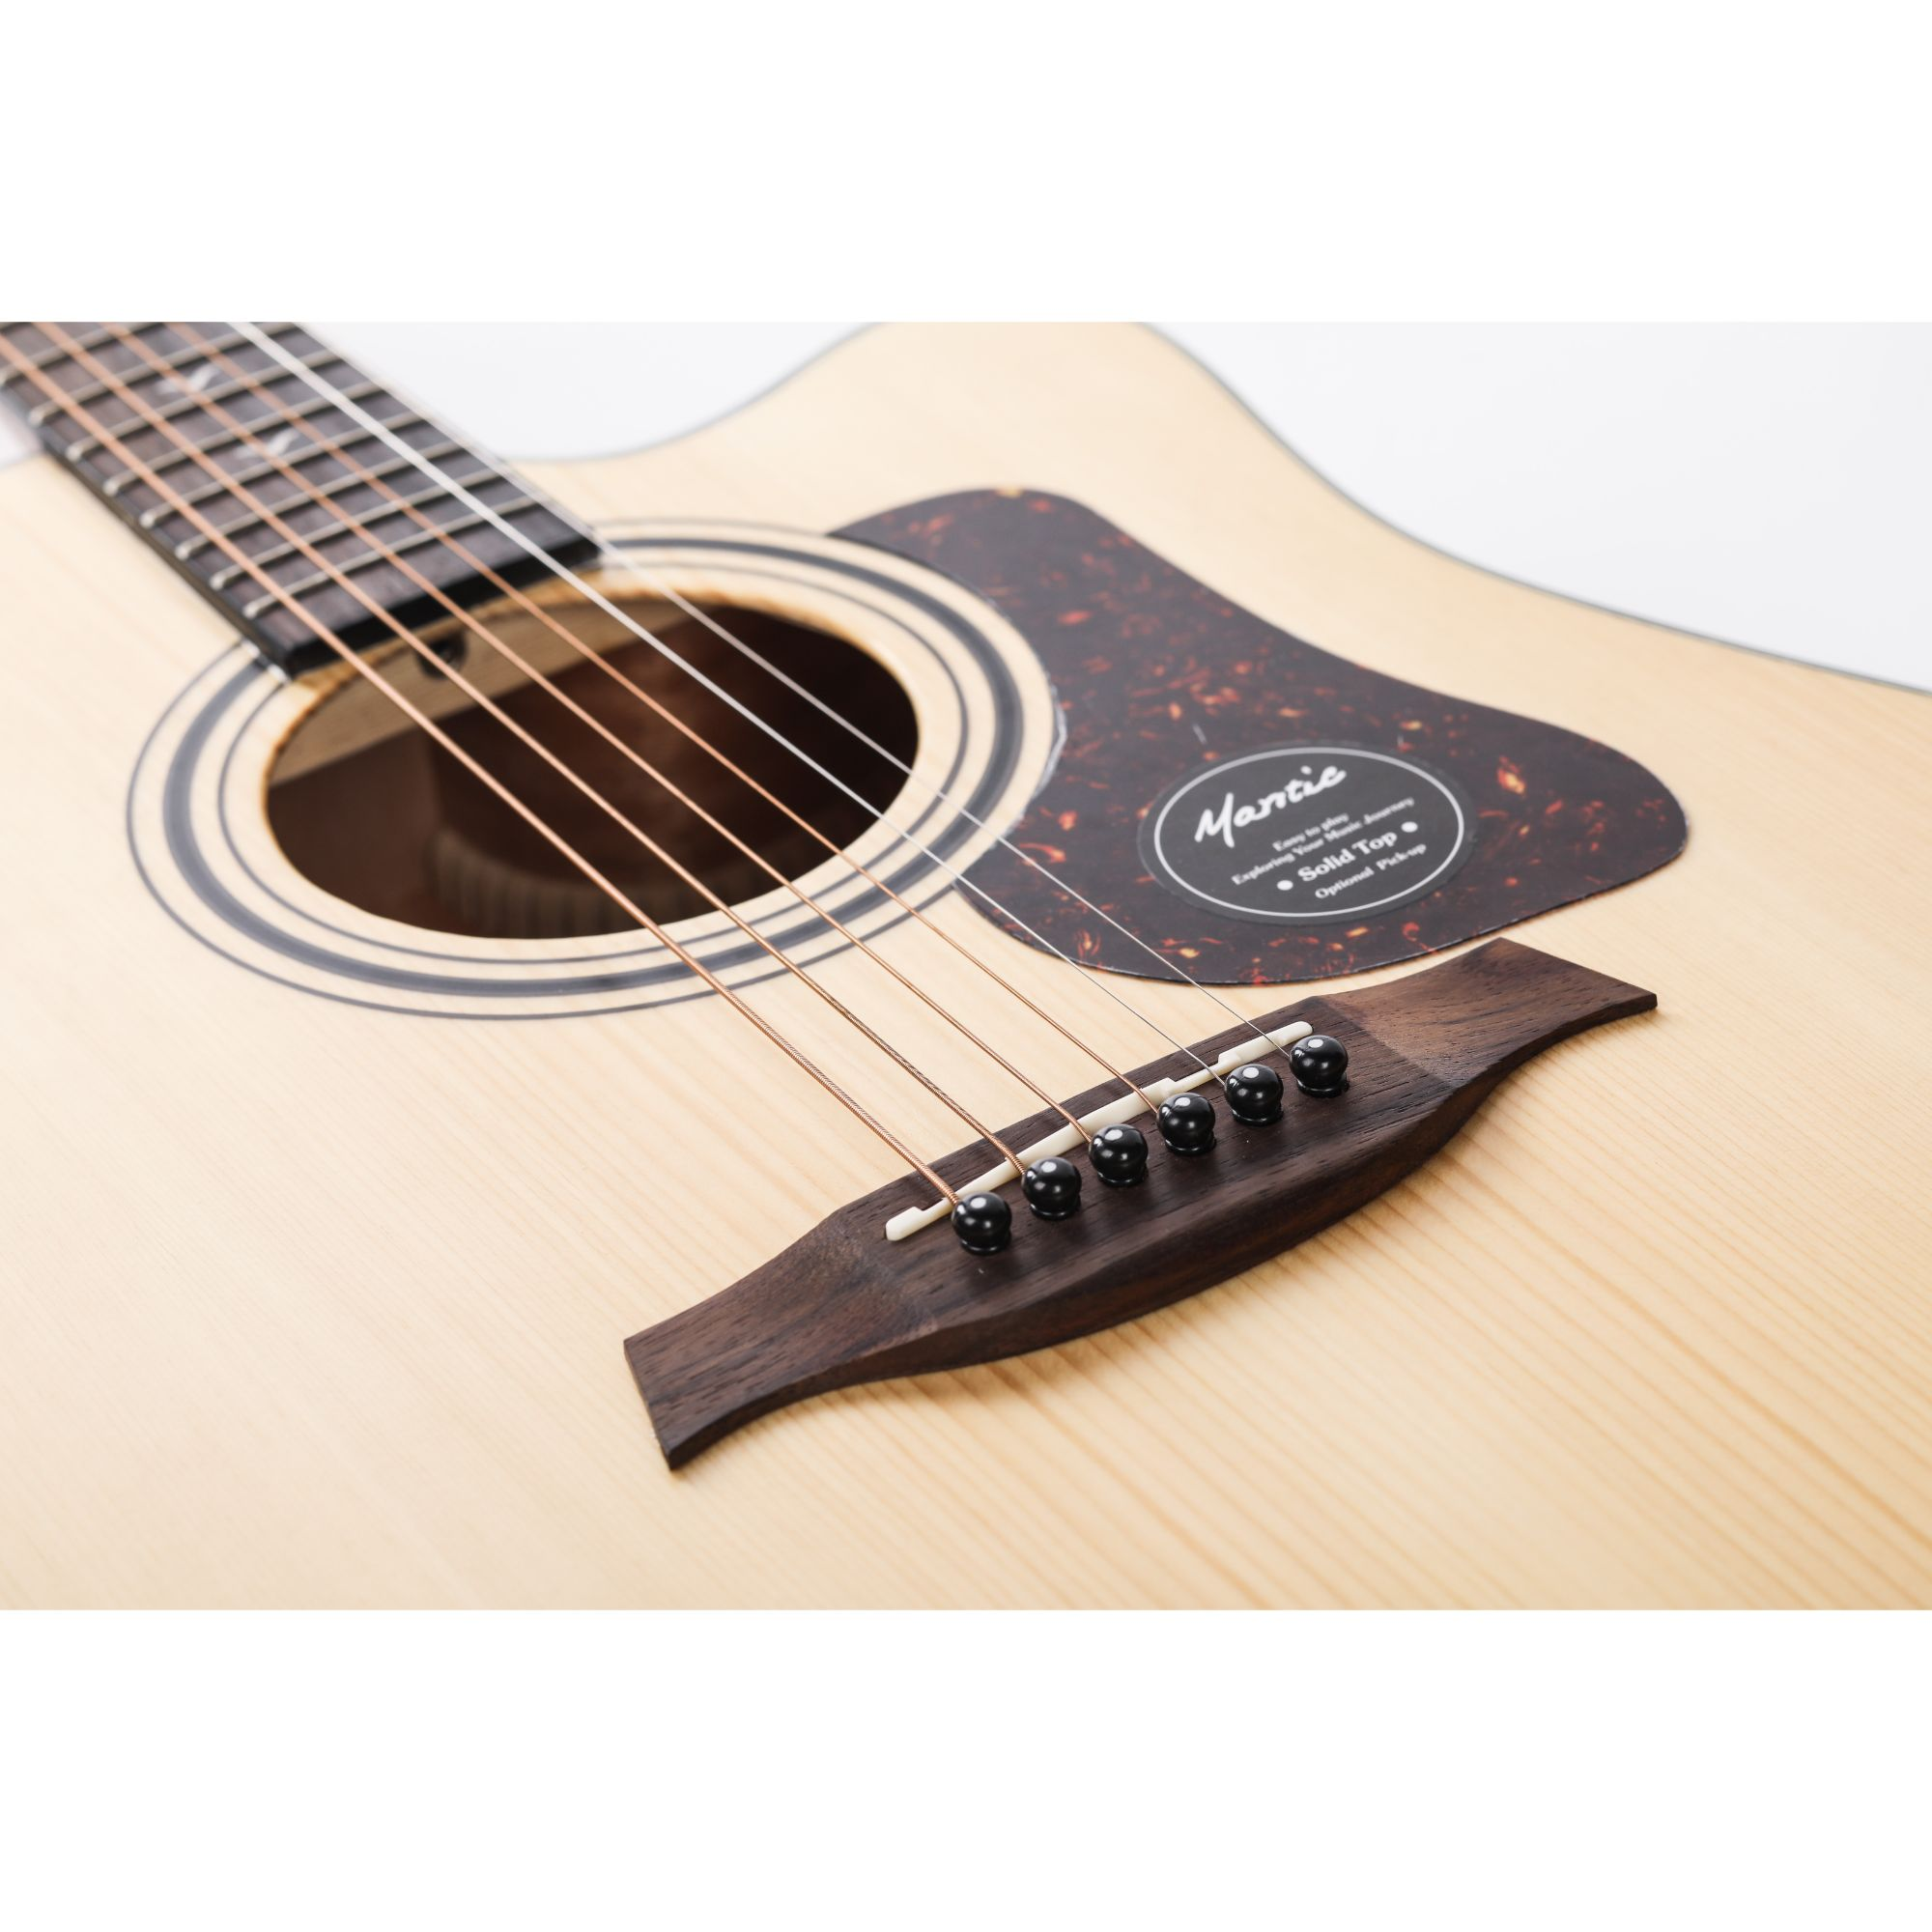 Mantic GT10DC Solid Top Acoustic Guitar - Natural